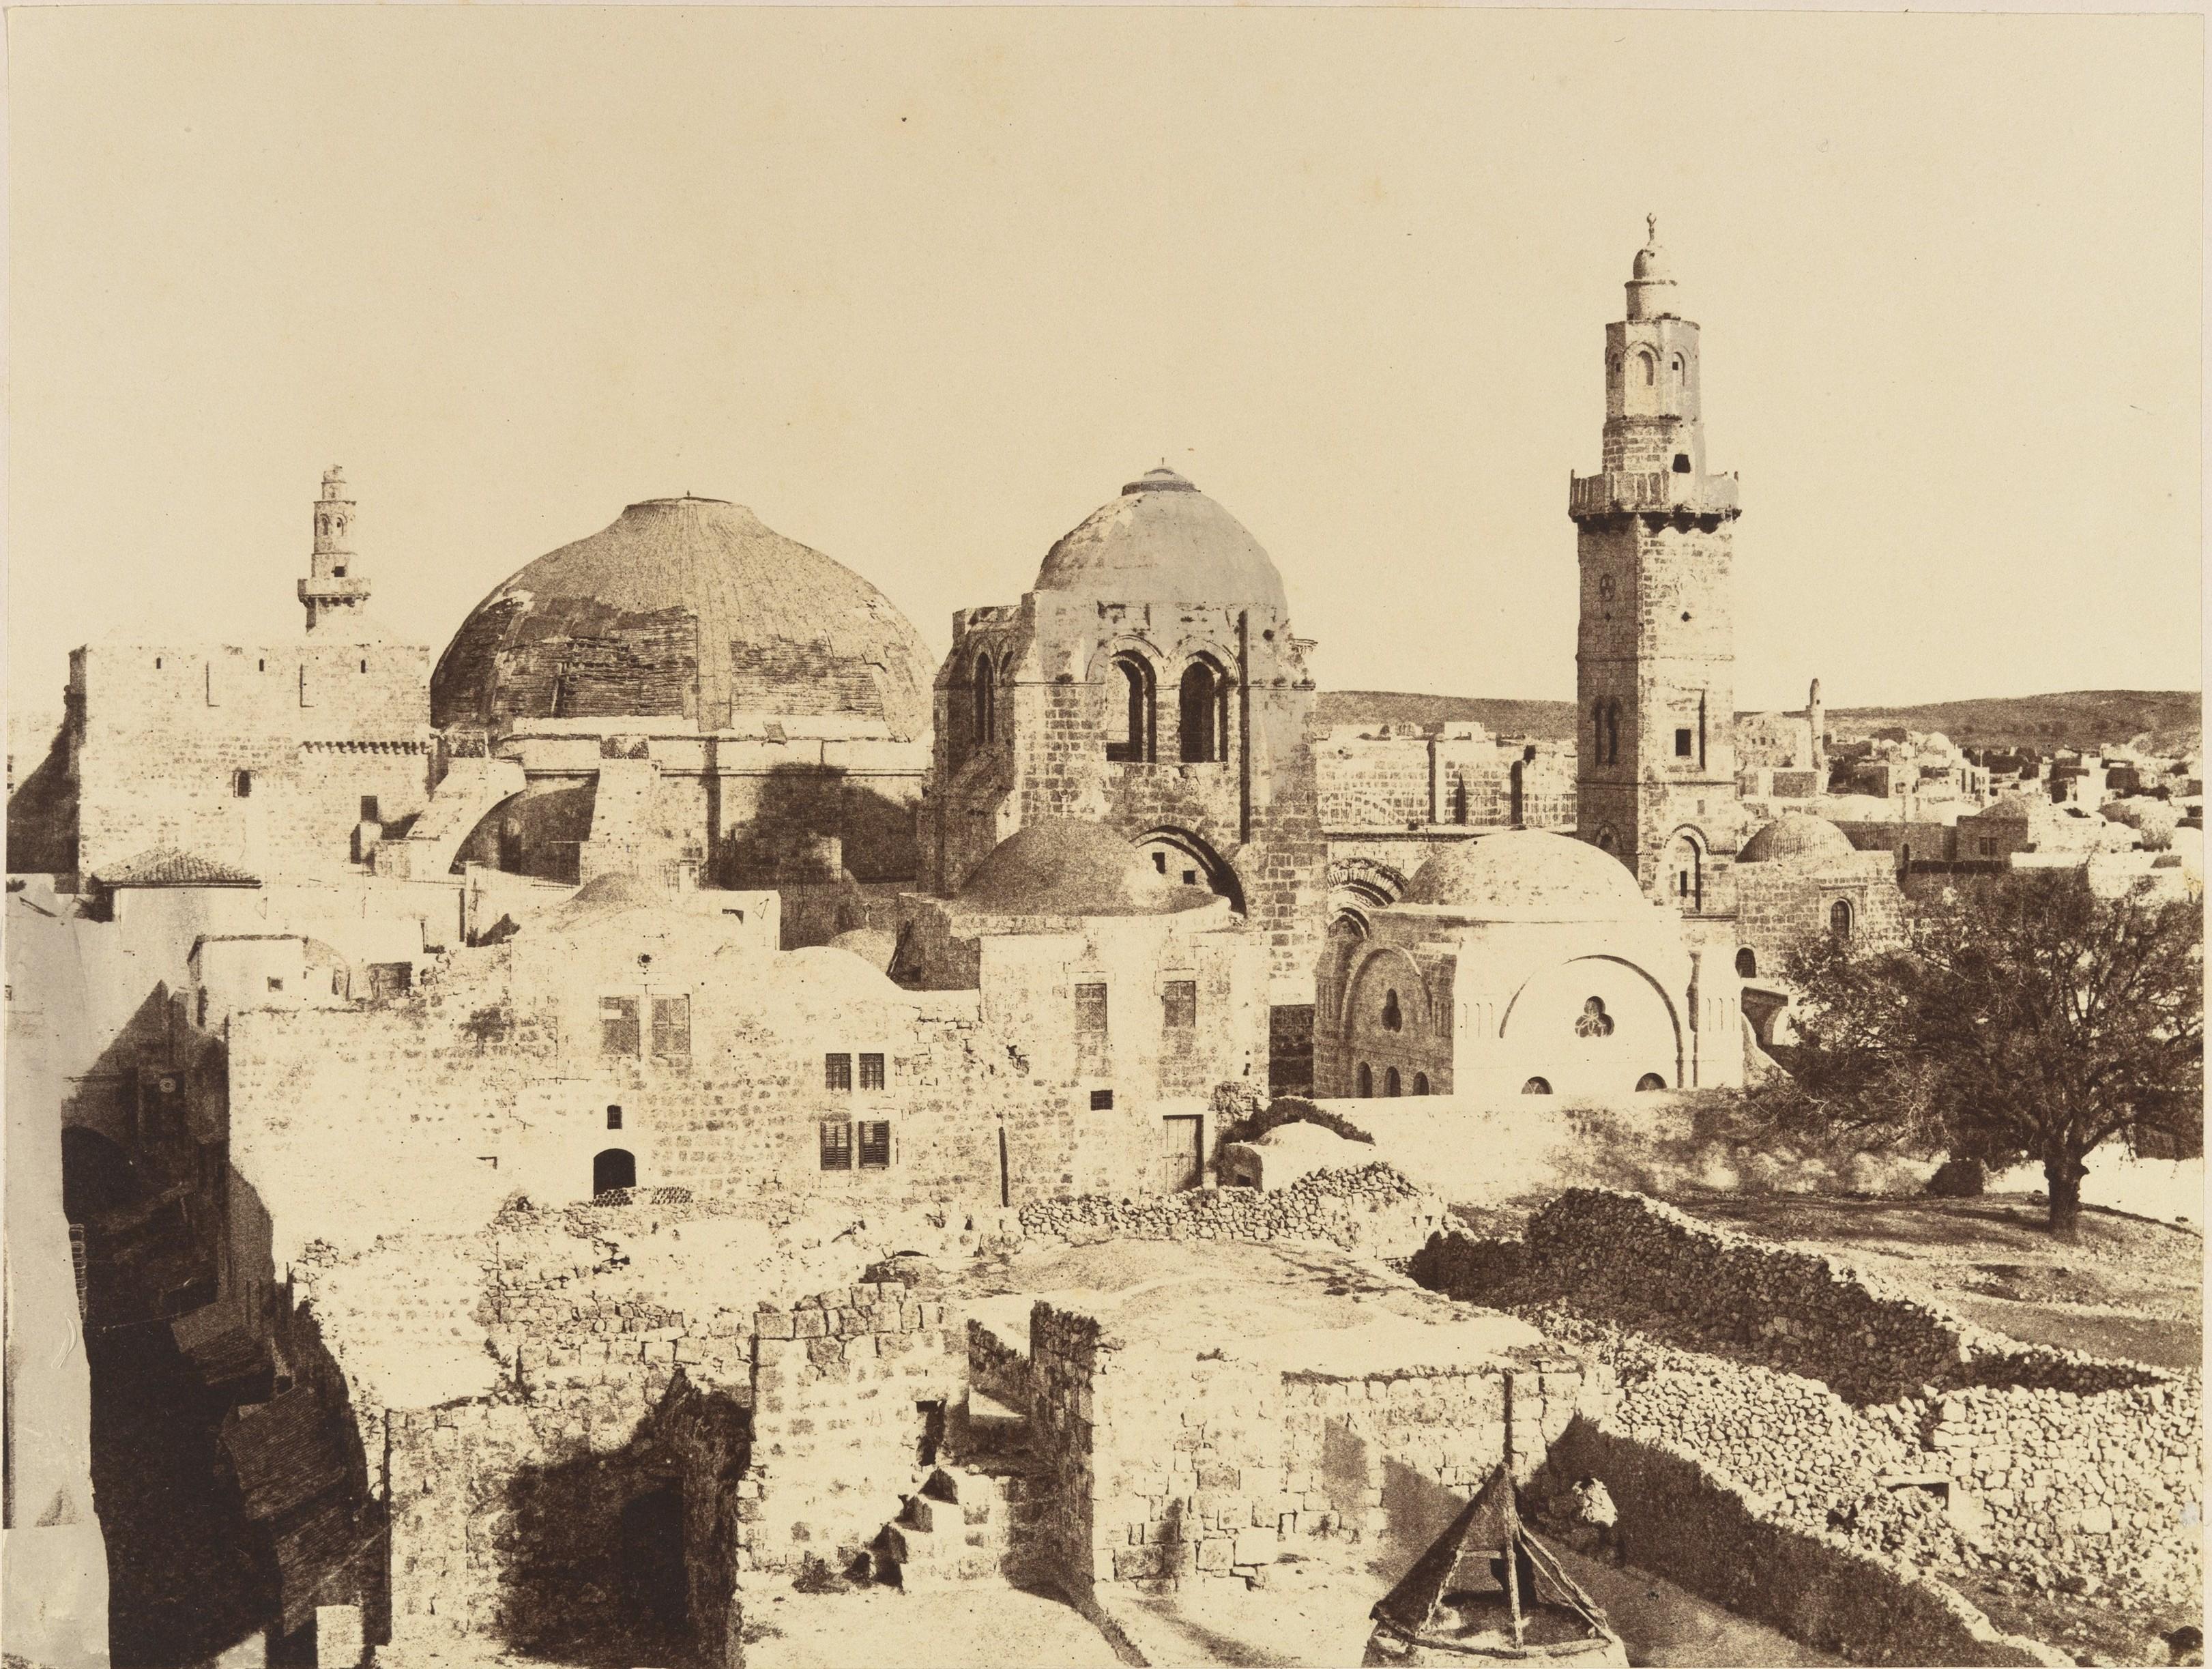 Текущее состояние купола храма Гроба Господня и минарет Омара